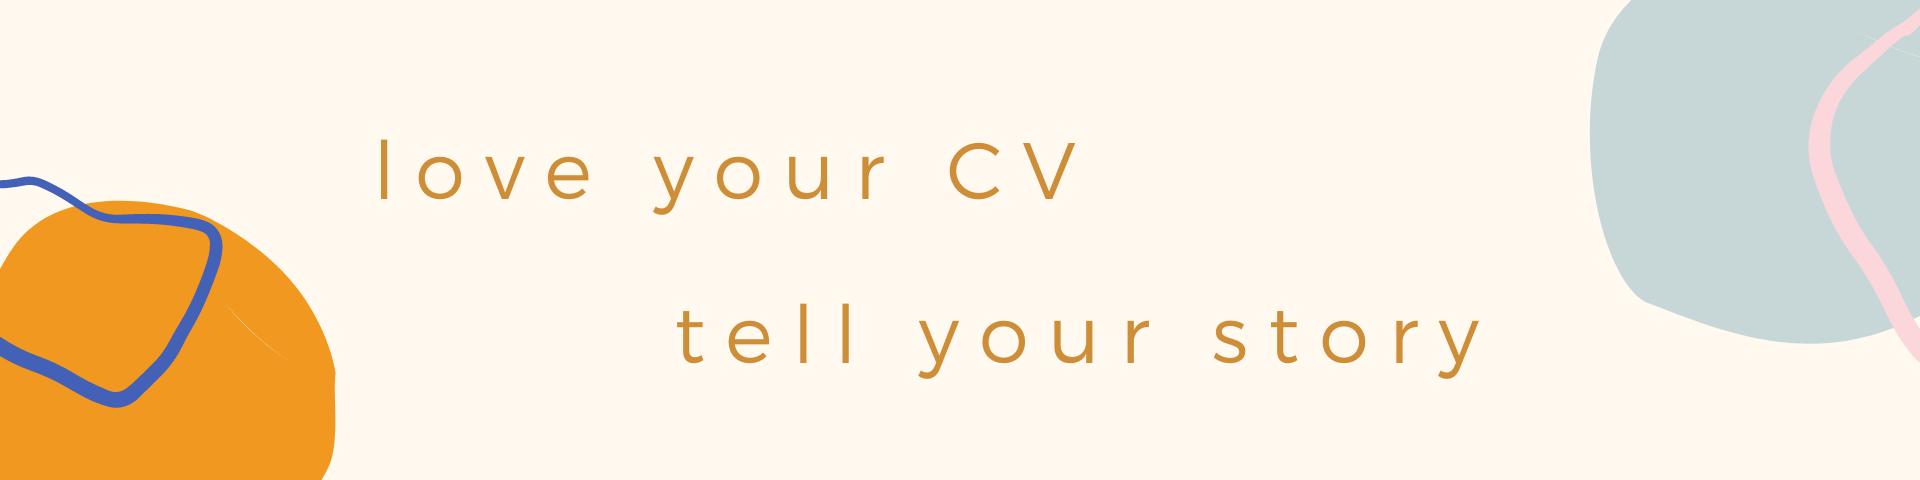 love your CV banner